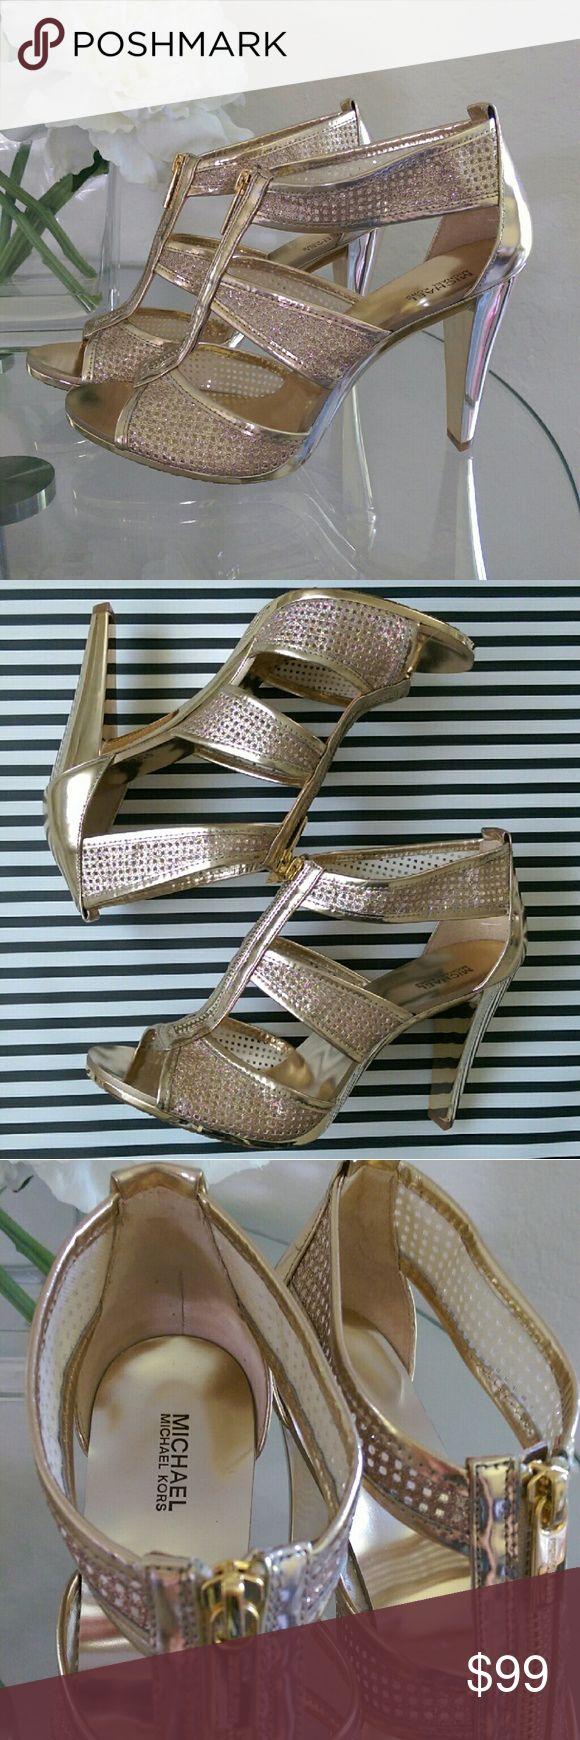 Michael Kors Gold Sandals Heels Shoes New Hard To Find MK Sandals Michael Kors  Shoes Heels